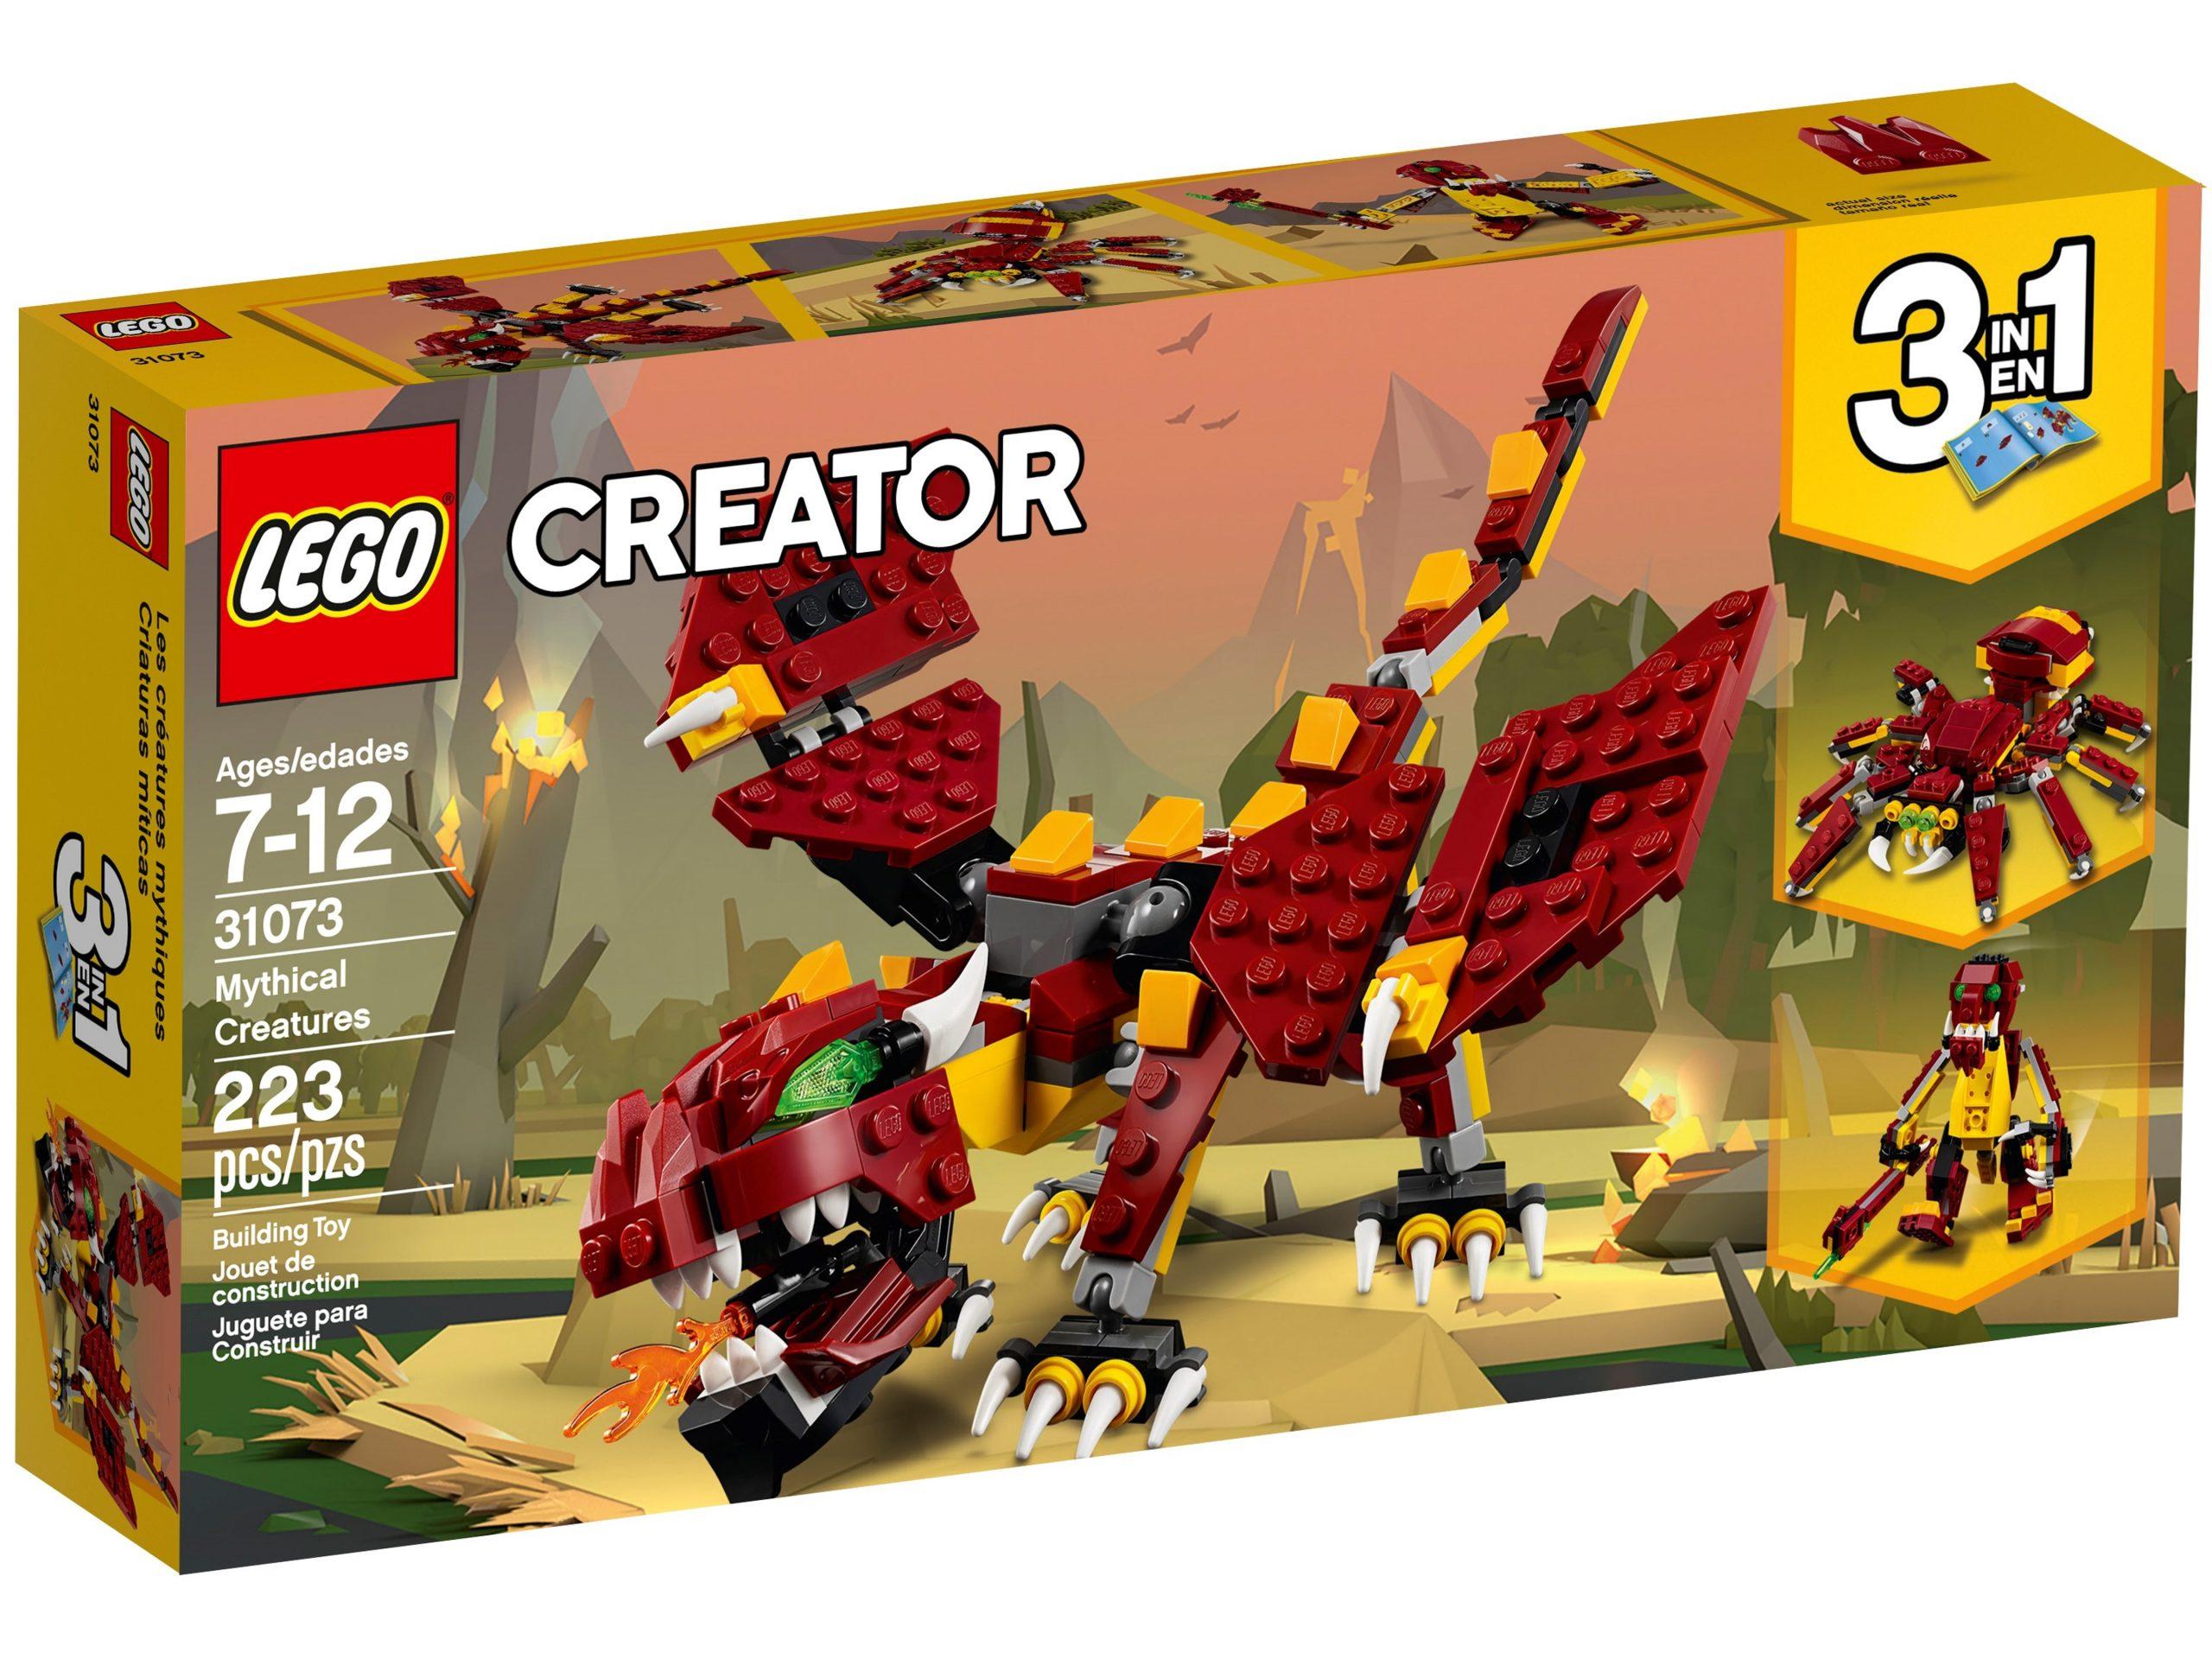 lego 31073 les creatures mythiques scaled